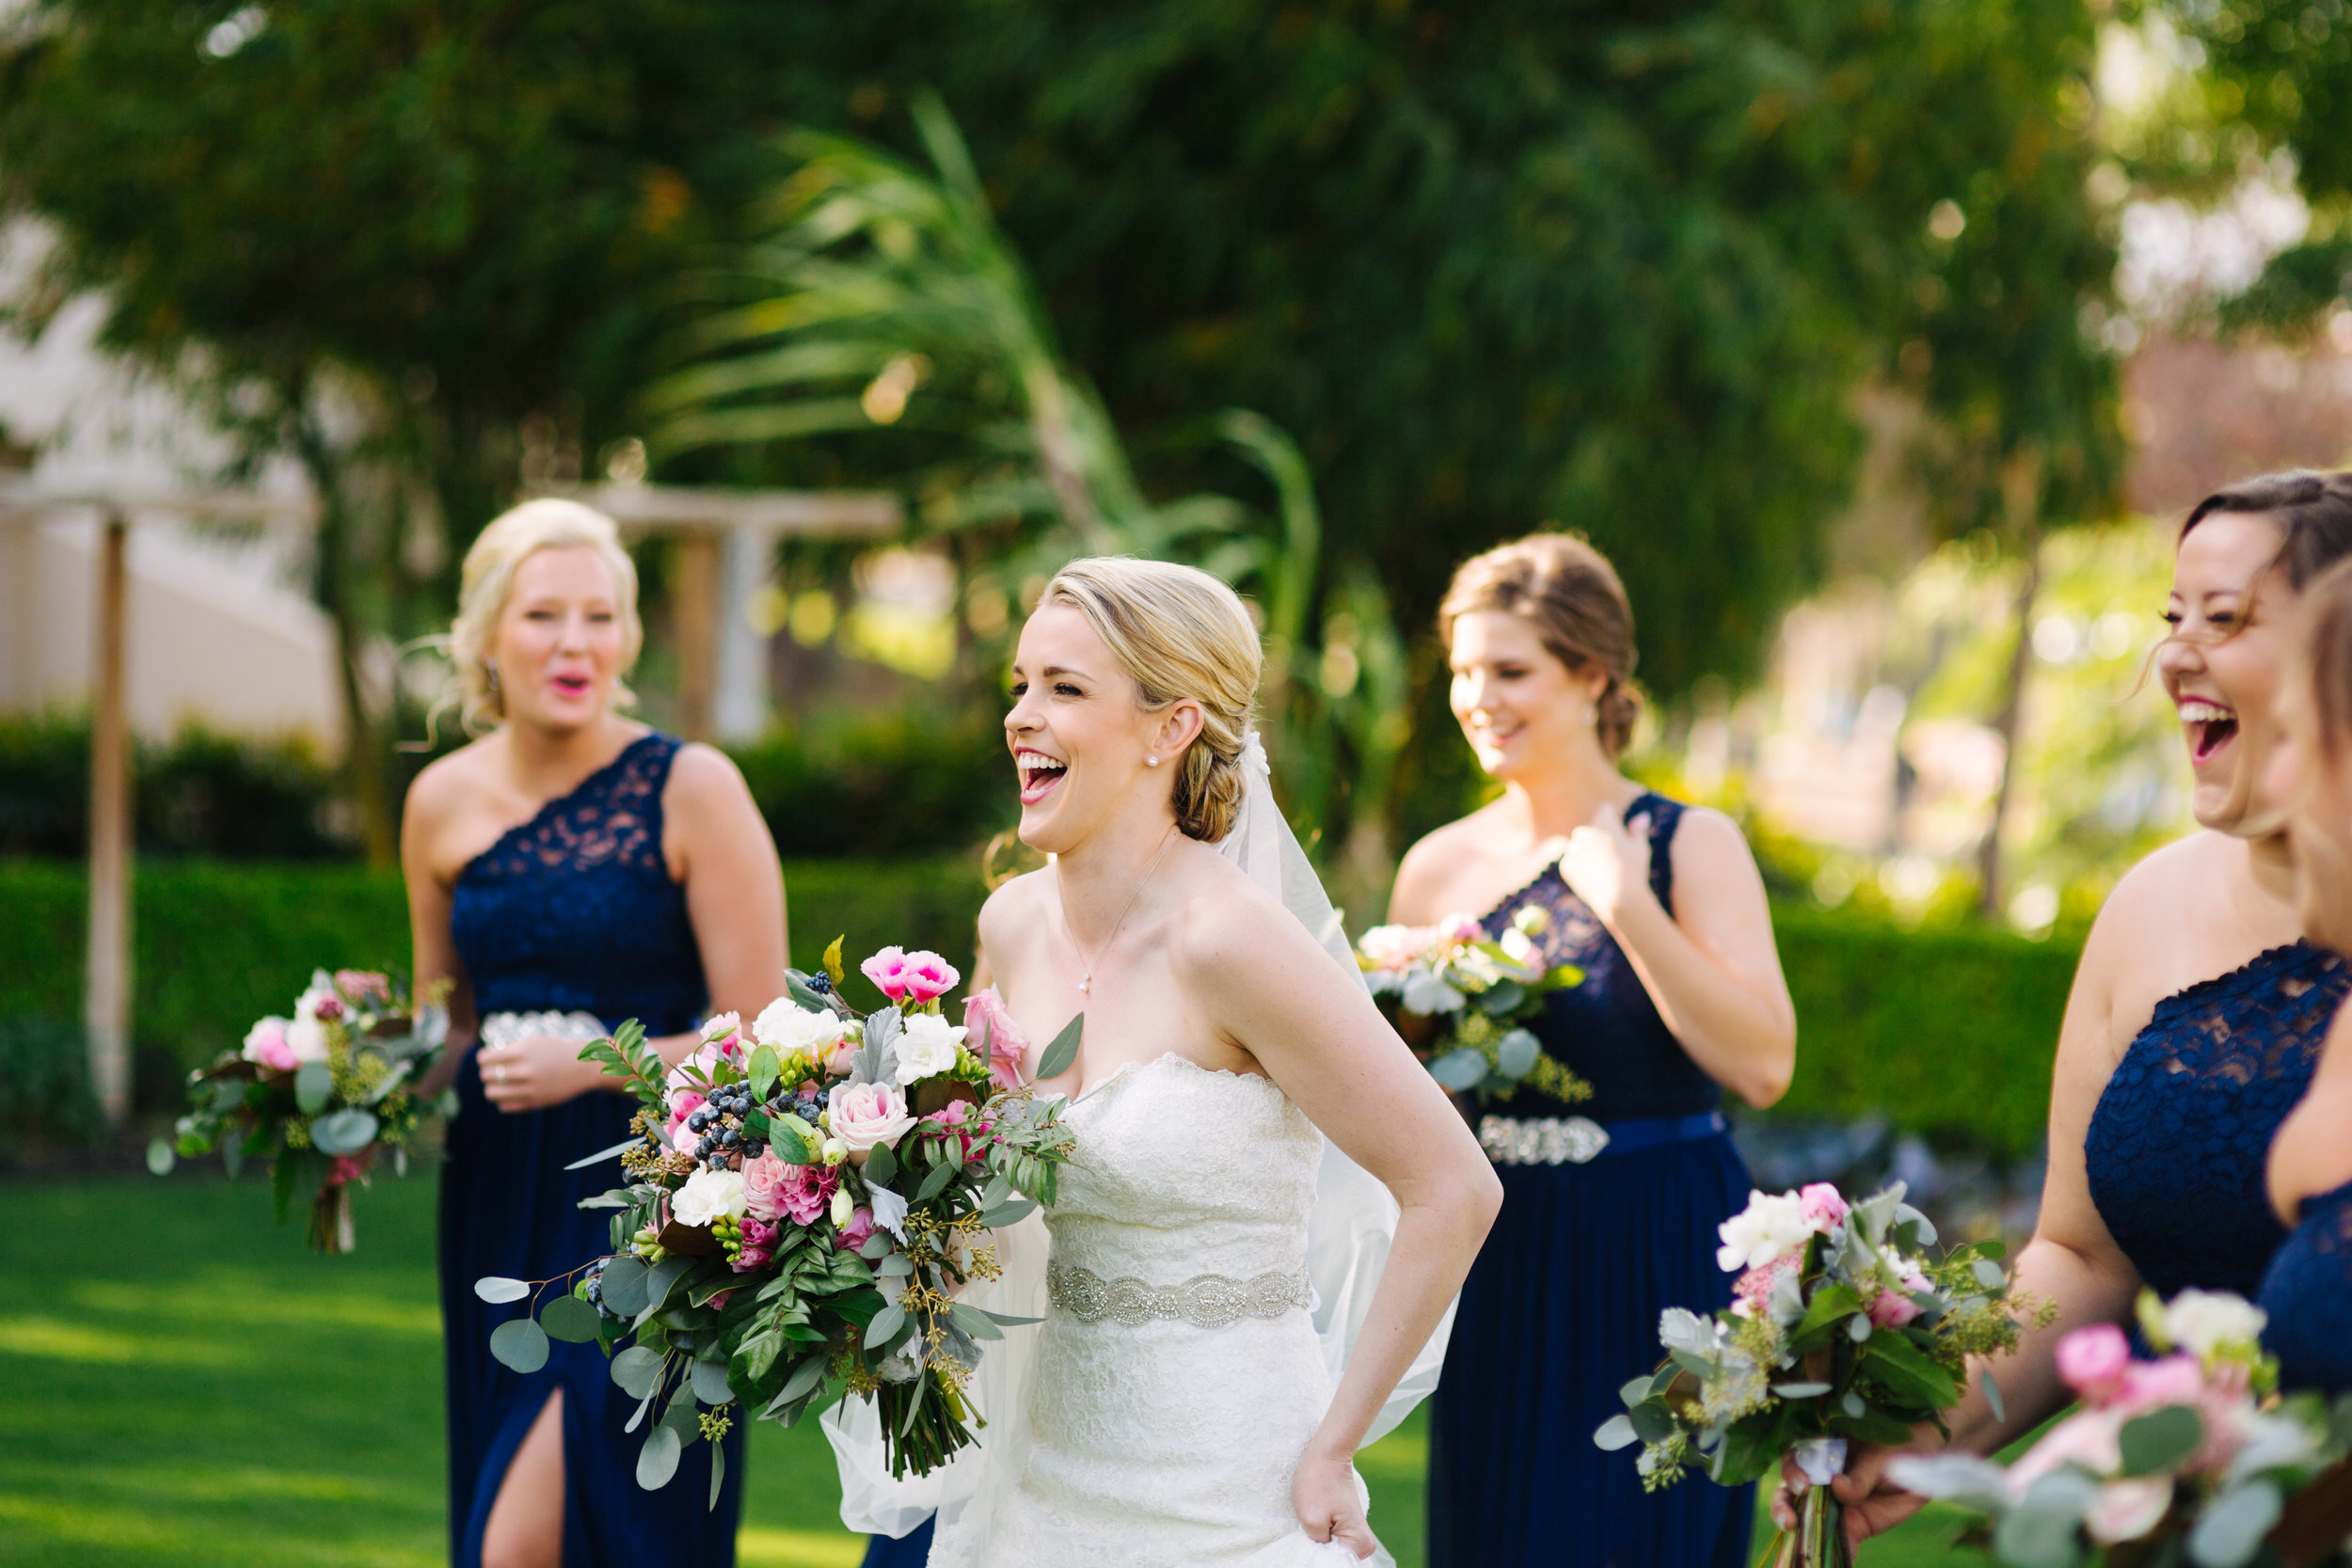 hollis gardens wedding downtown lakeland wedding jake and katie photography-16.jpg